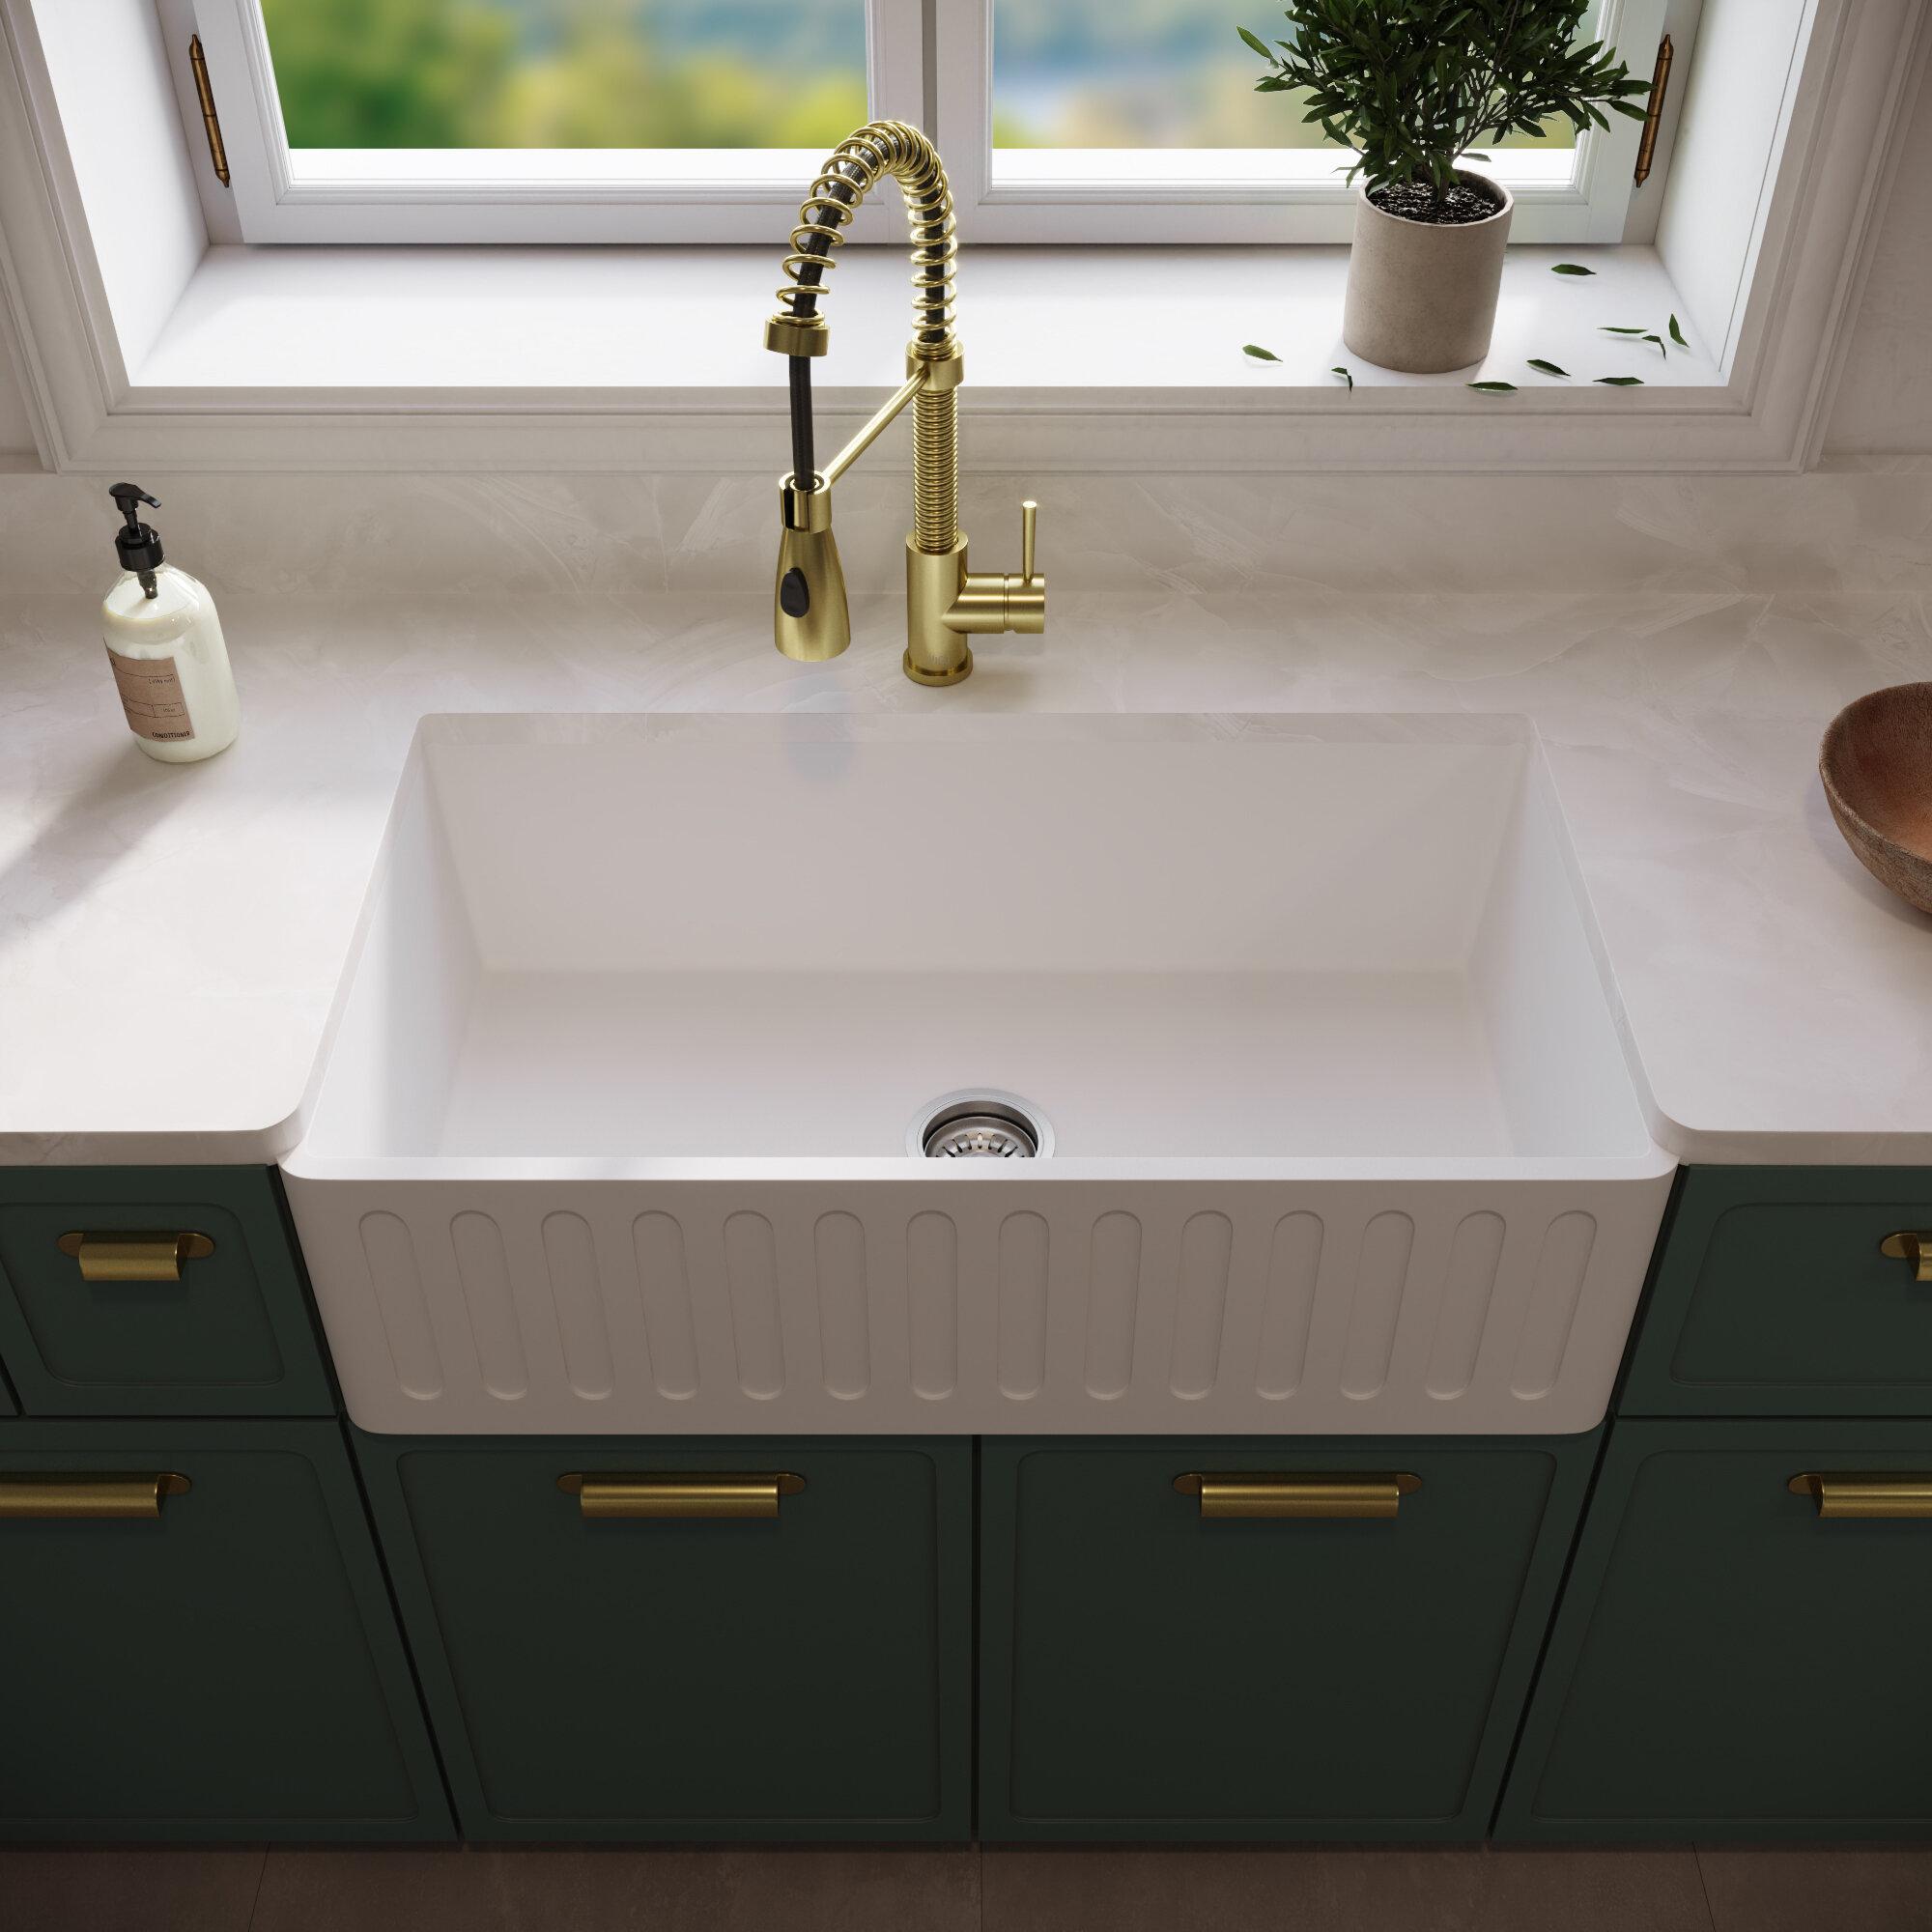 Picture of: Vigo Matte Stone 33 L X 18 W Farmhouse Apron Kitchen Sink With Basket Strainer Reviews Wayfair